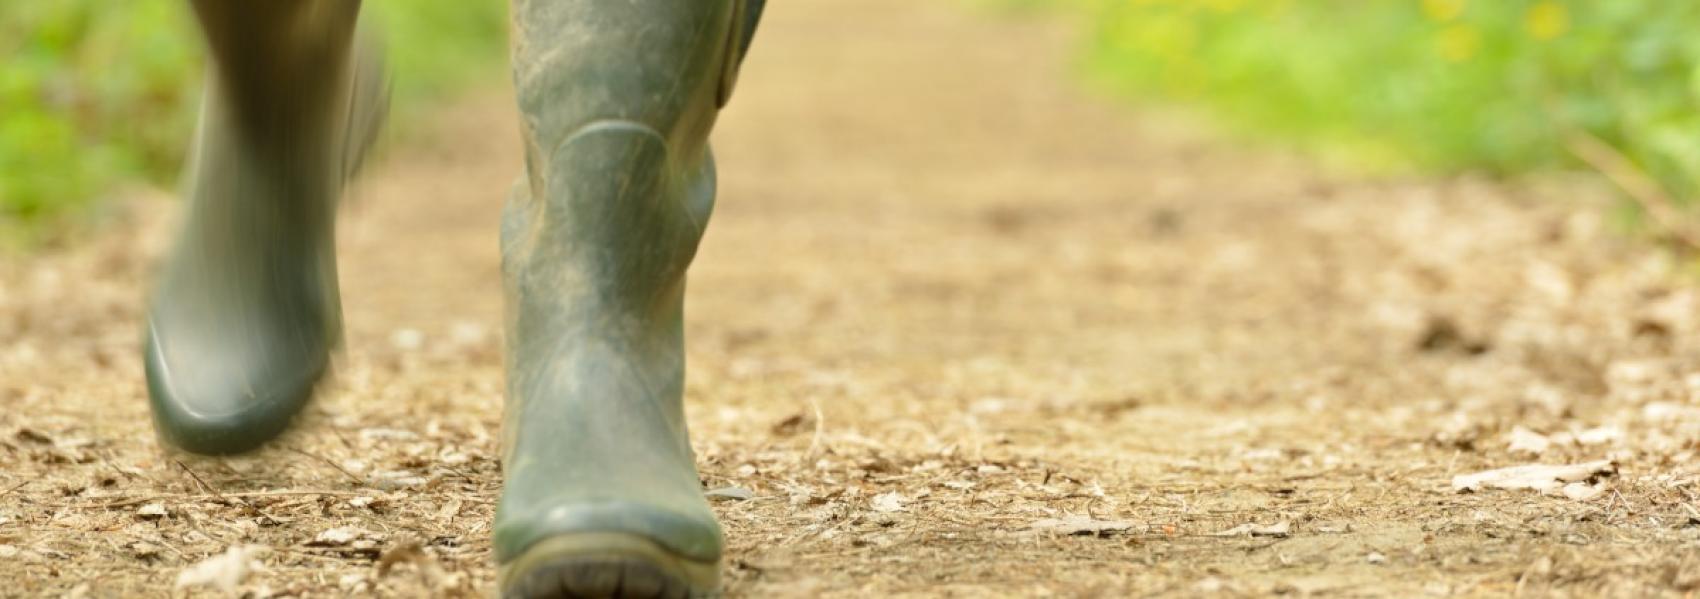 wandellaarzen